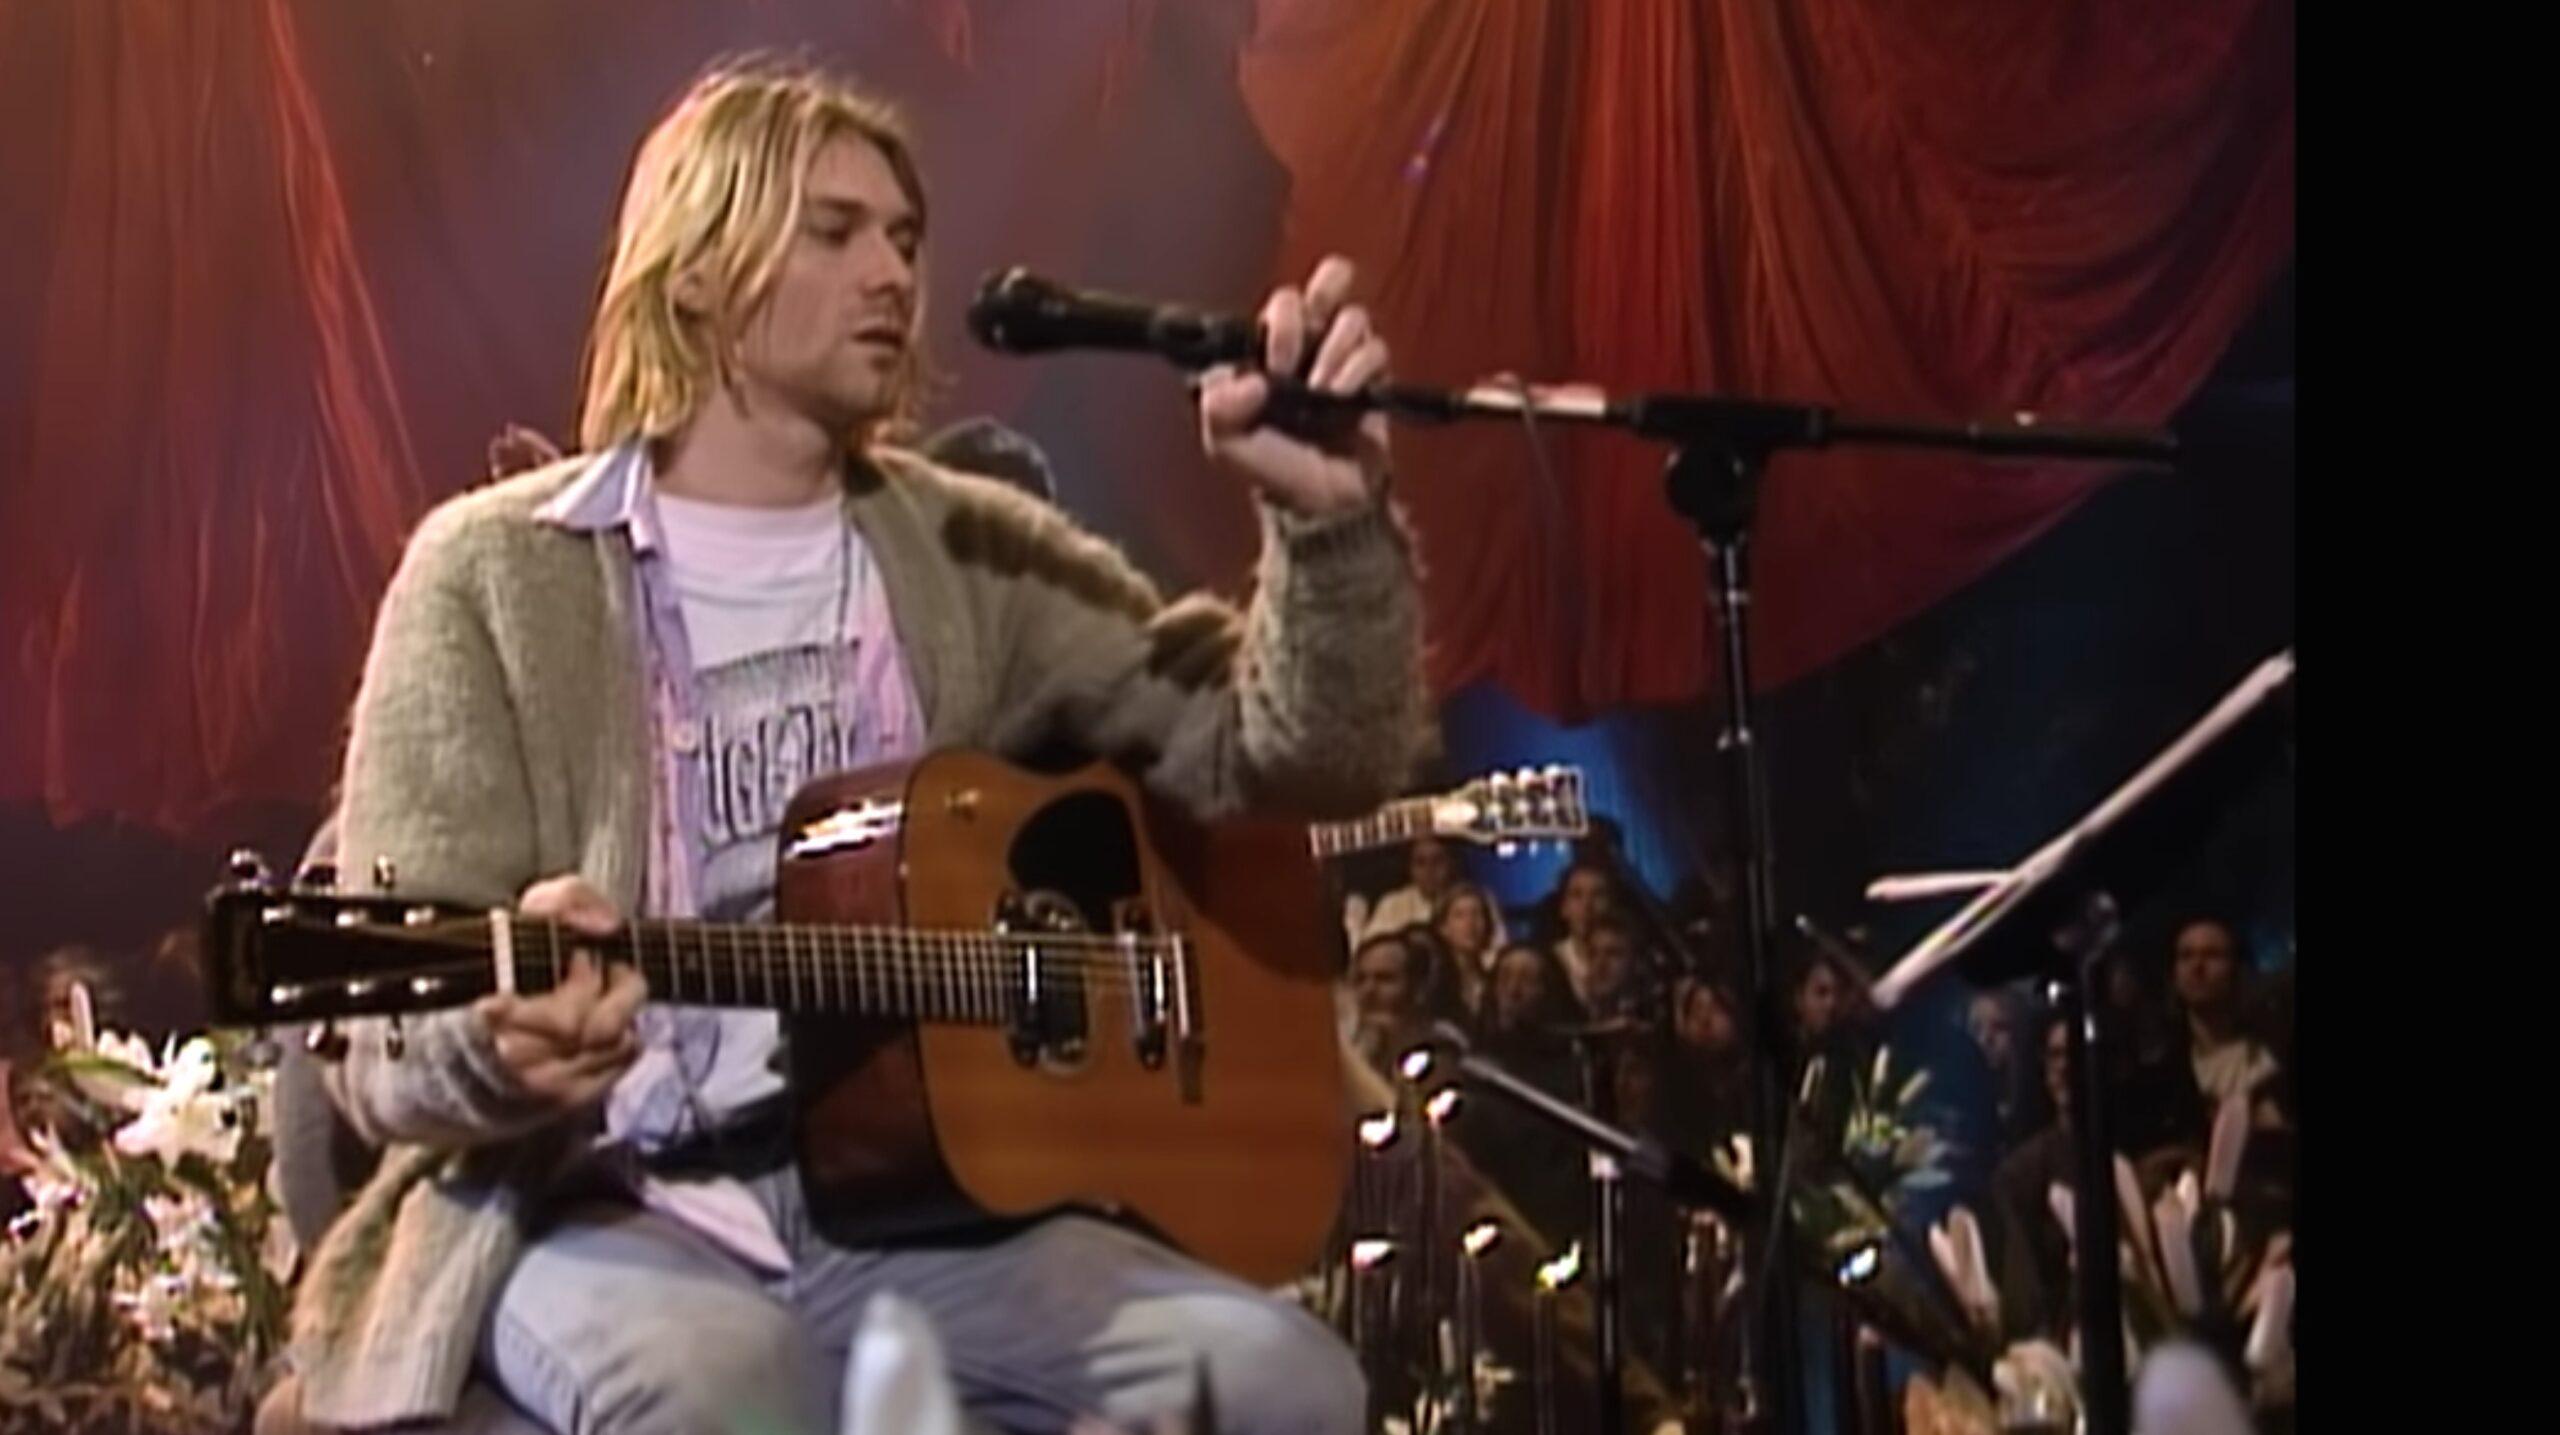 Kurt Cobain superstar. La sua chitarra venduta al record di 6 milioni di dollari